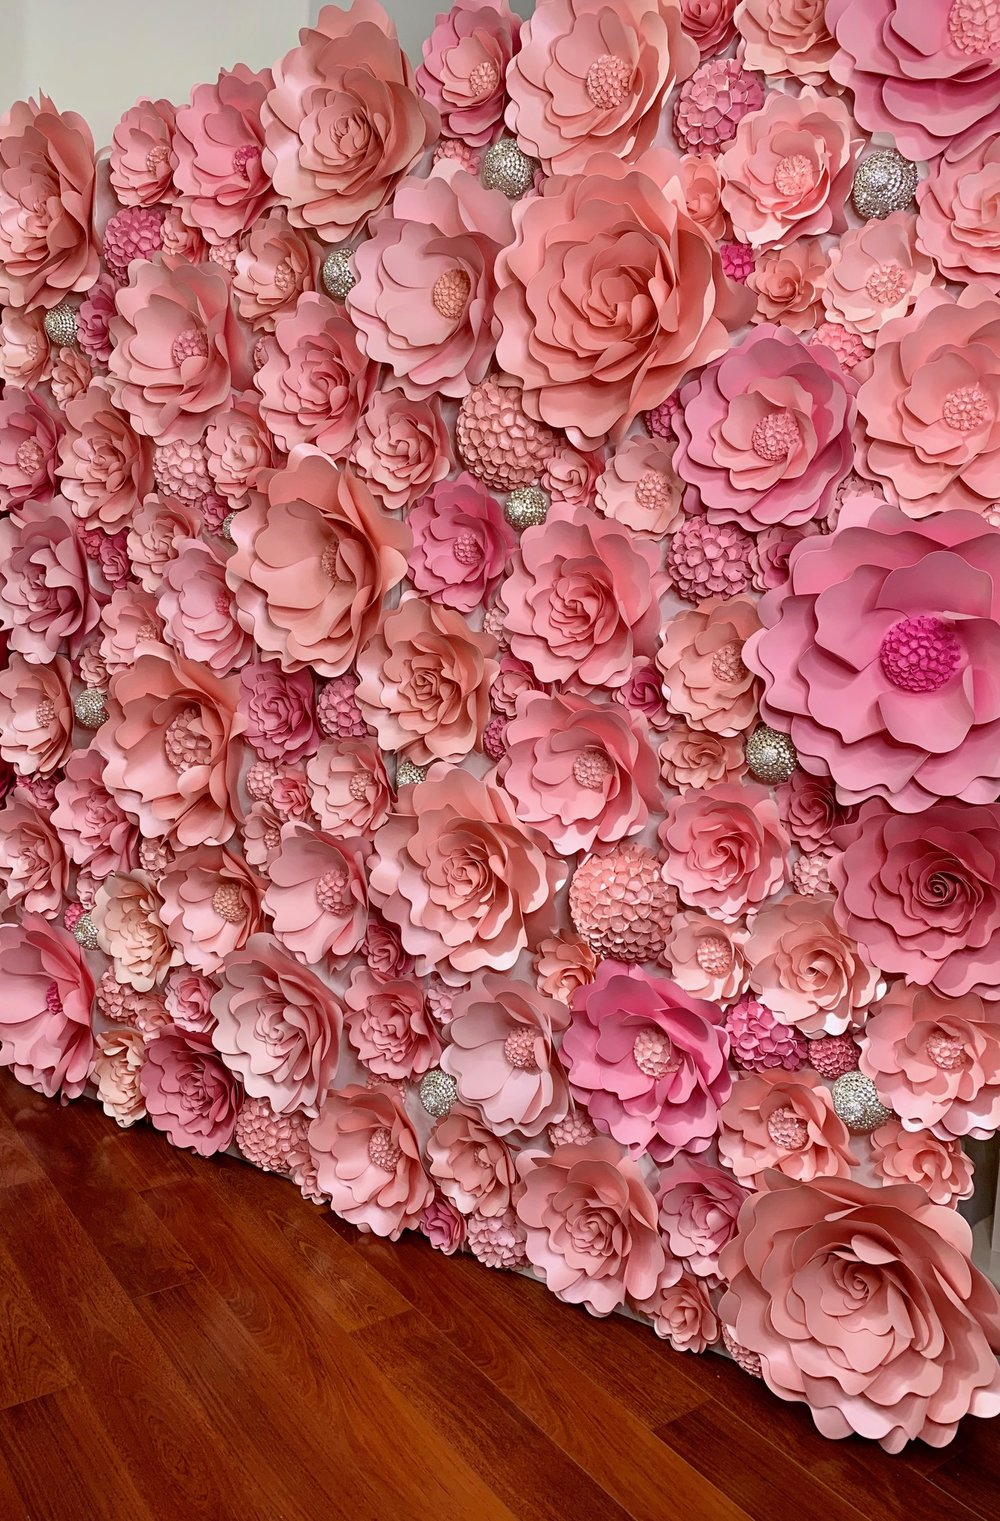 mahi rehan flower backdrop rentals